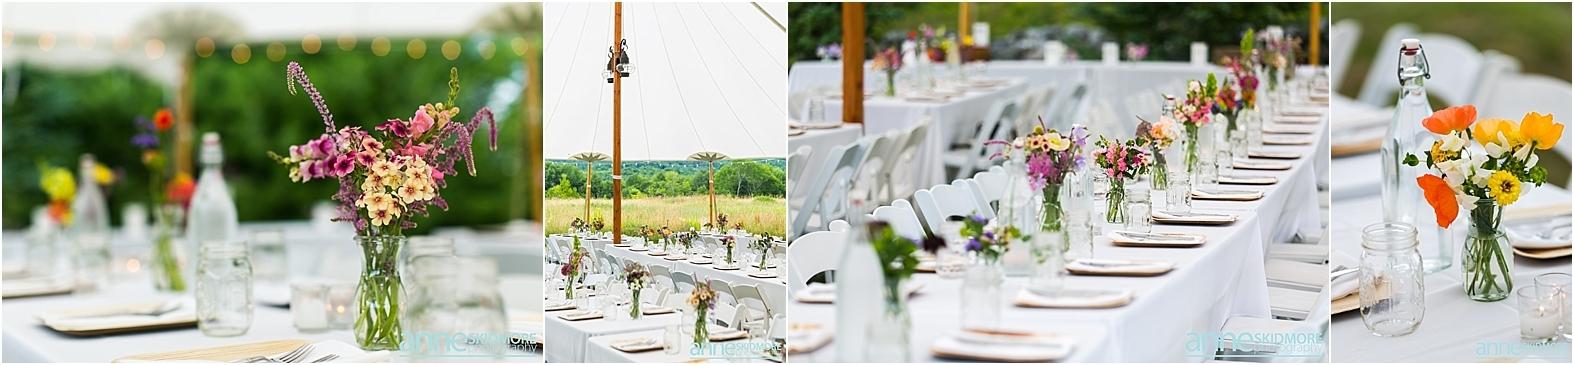 Maine_Barn_Wedding_0047